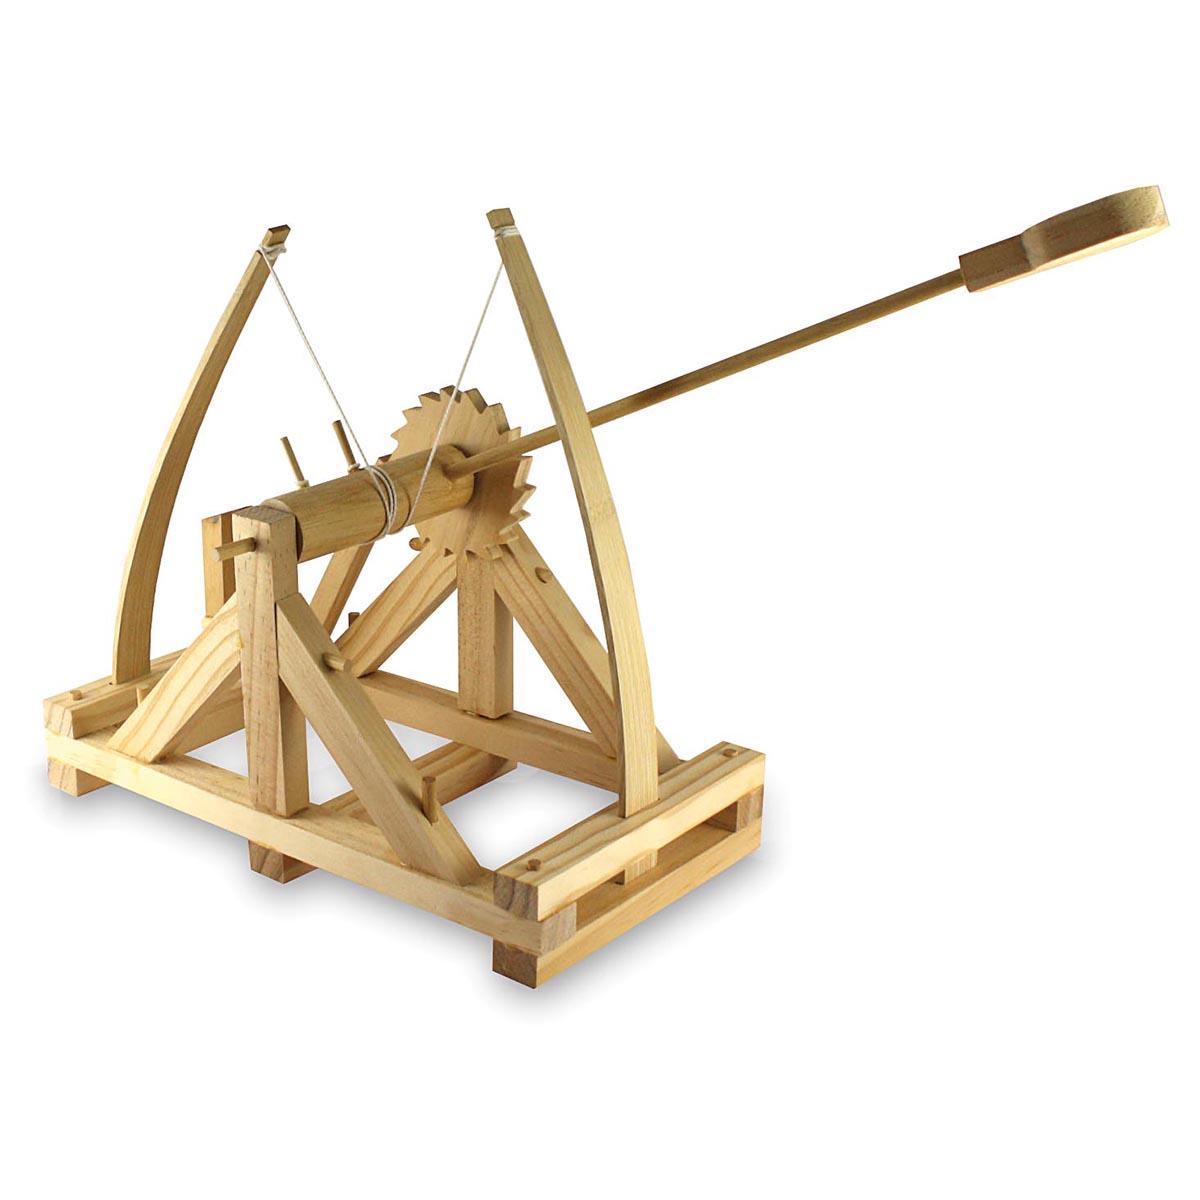 Da vinci catapult kit w64067 geek gifts science geek for Kit da 3 bay